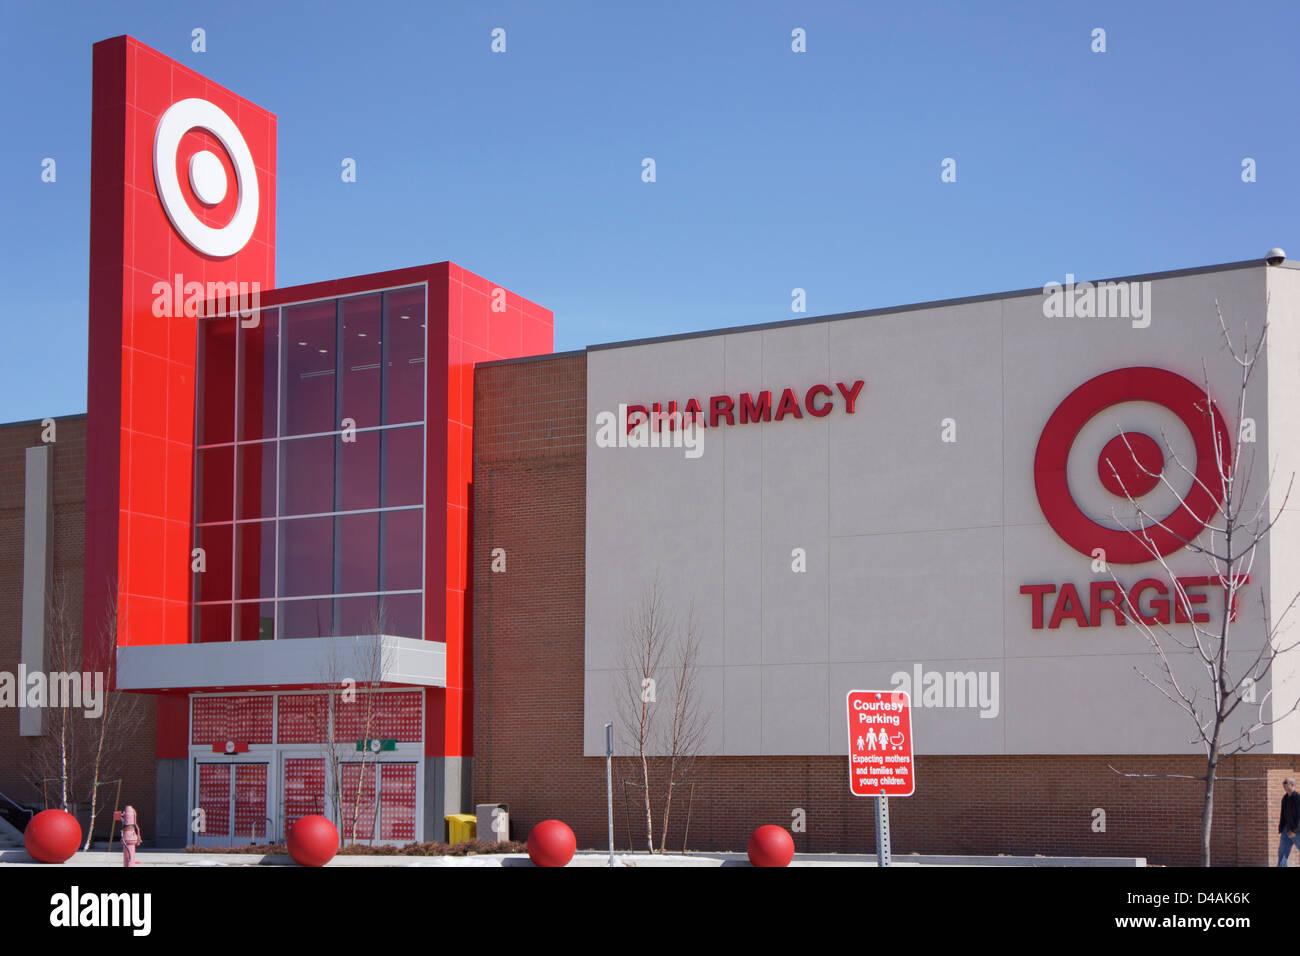 Target Store - Stock Image